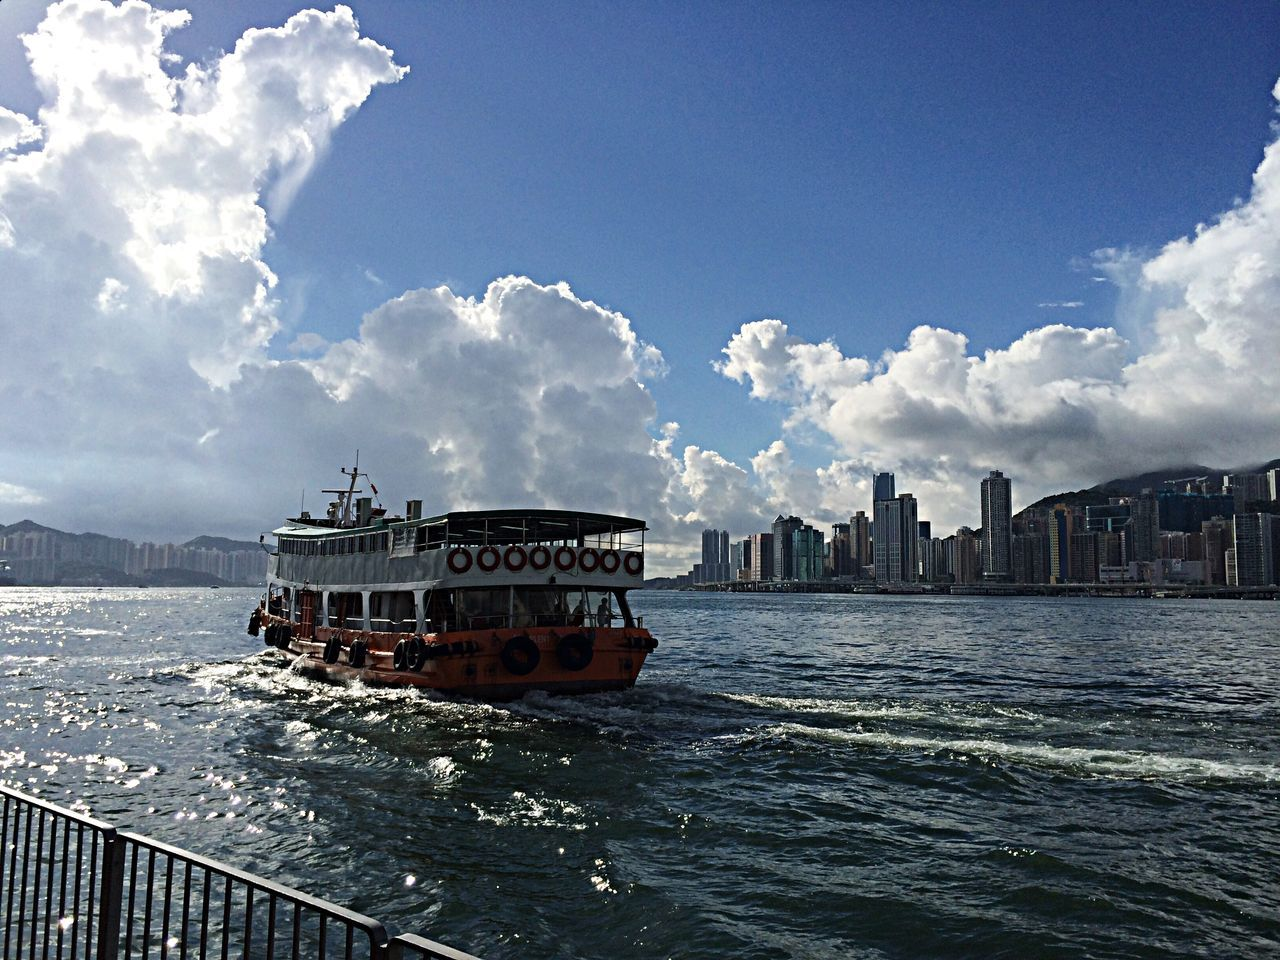 Ferry Enjoying Life Enjoying The Sights Relaxing